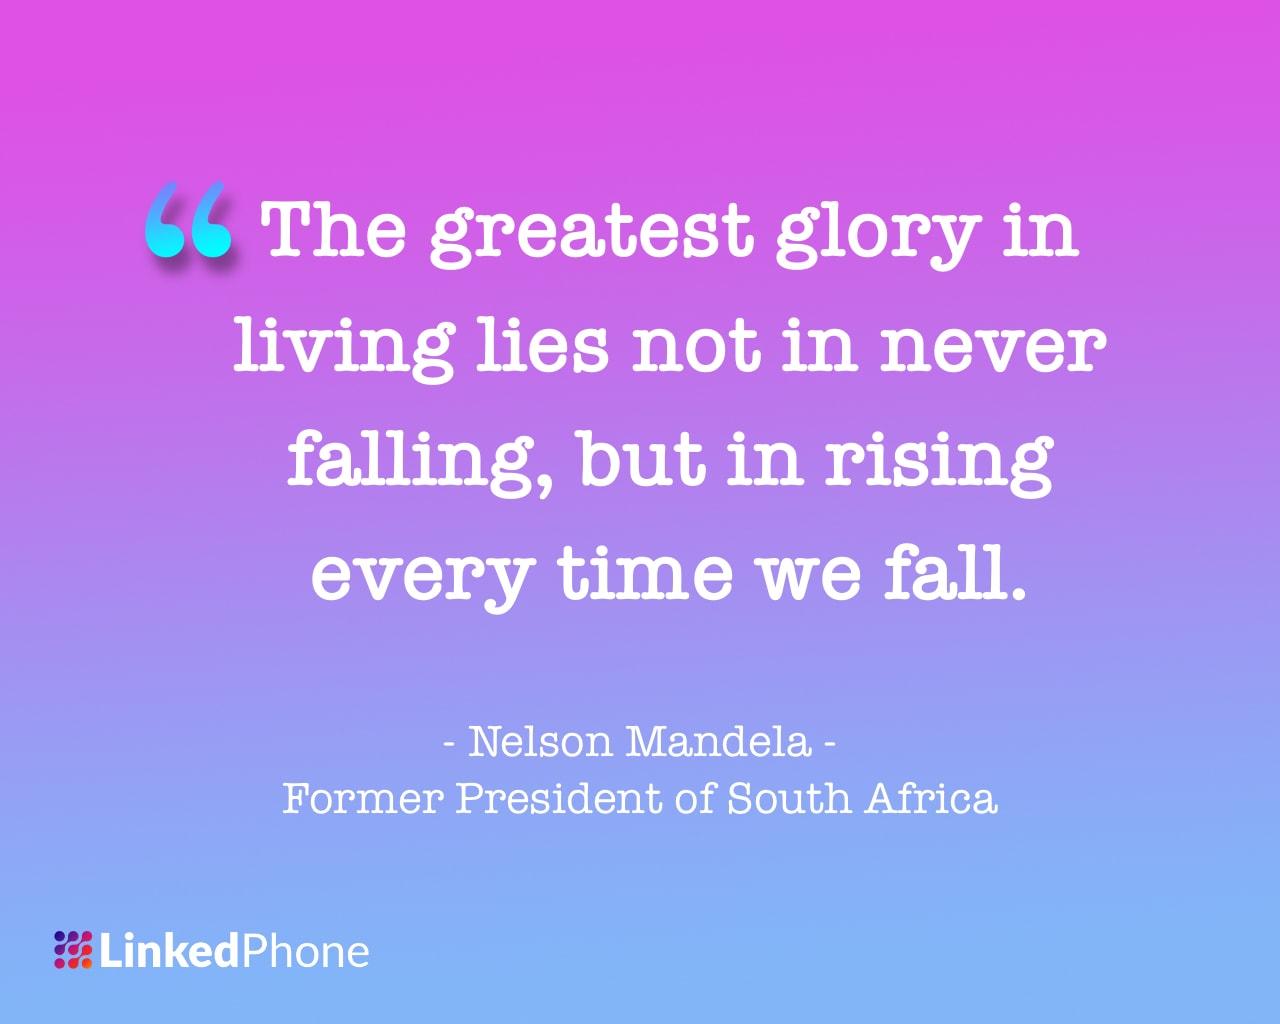 Nelson Mandela - Motivational Inspirational Quotes and Sayings